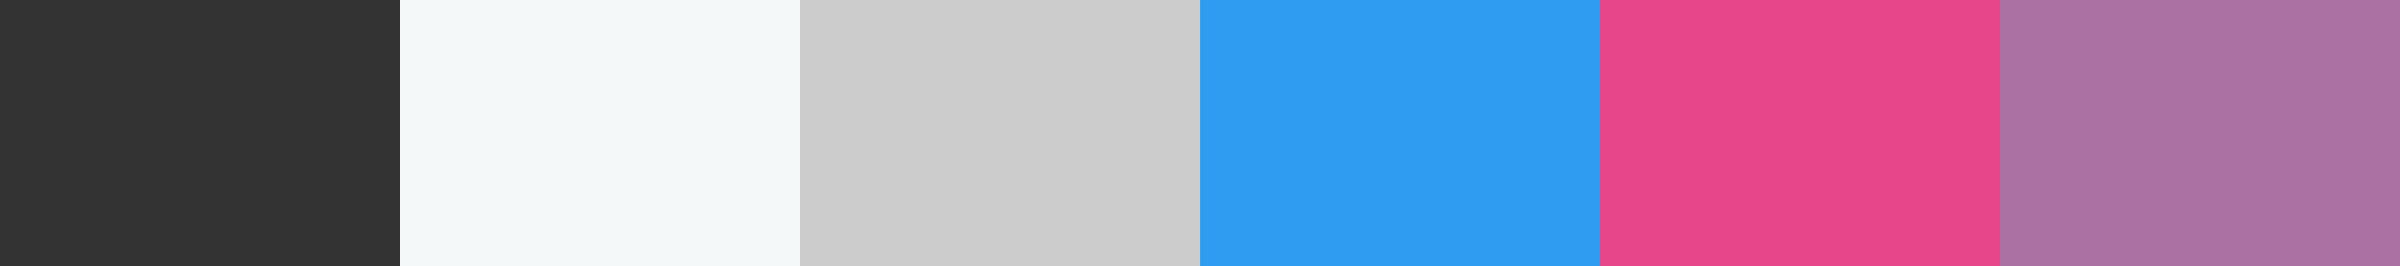 YC-palette-02